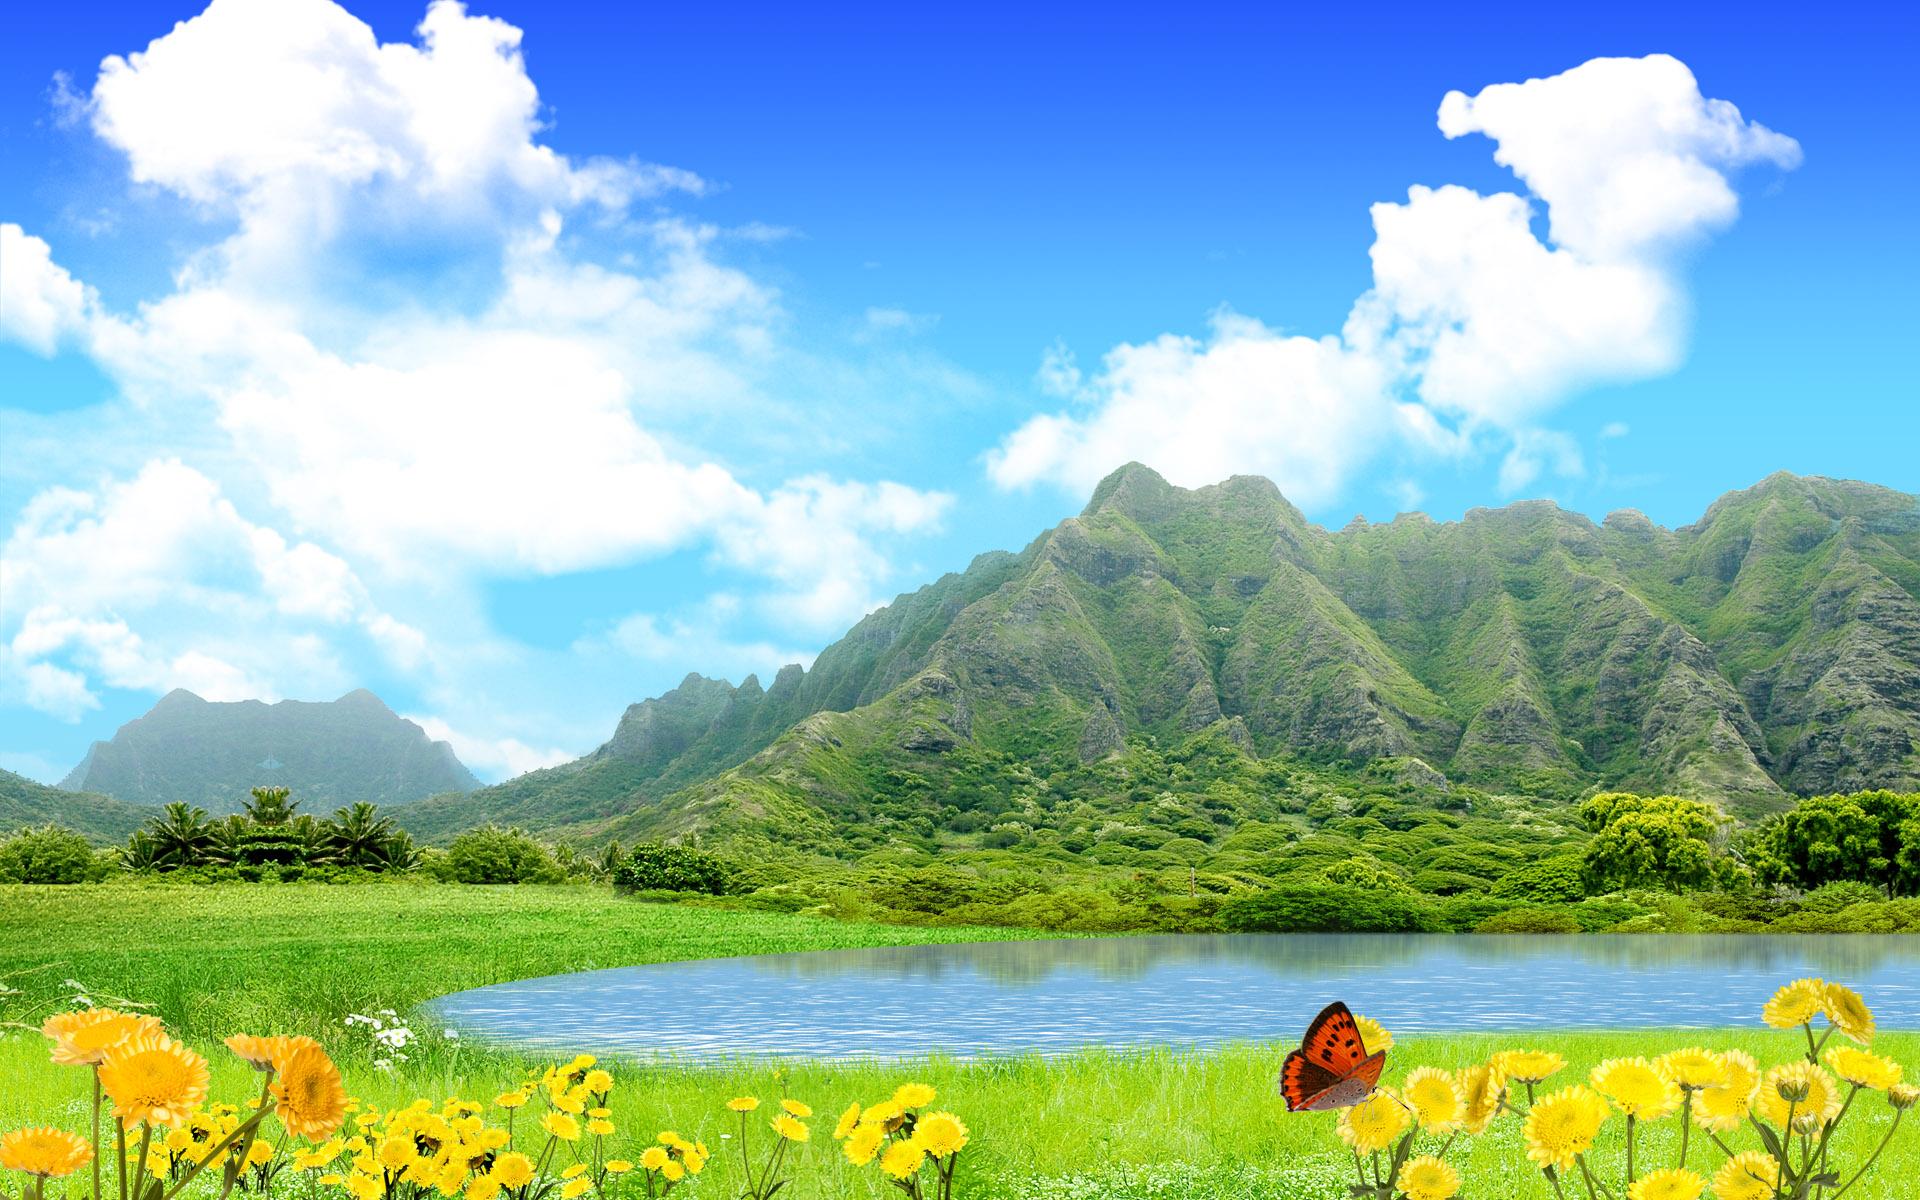 scenery wallpaper includes - photo #3